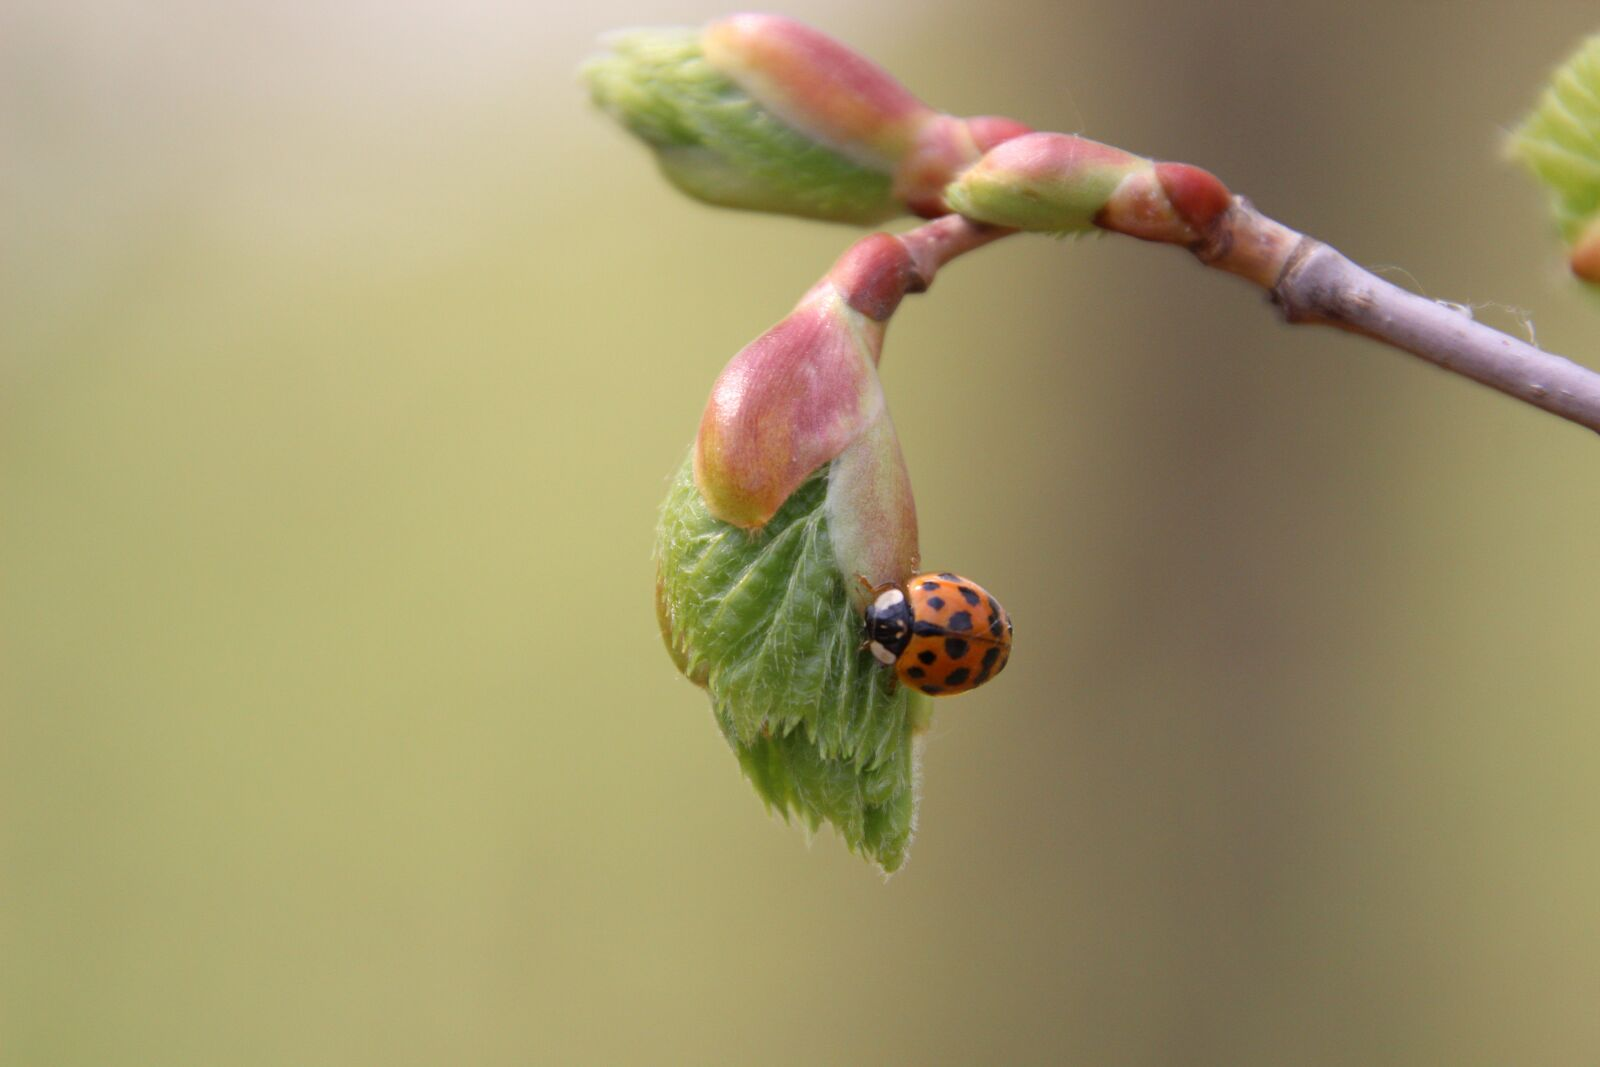 "Canon EOS 600D (Rebel EOS T3i / EOS Kiss X5) sample photo. ""Nature, leaf bud, ladybug"" photography"